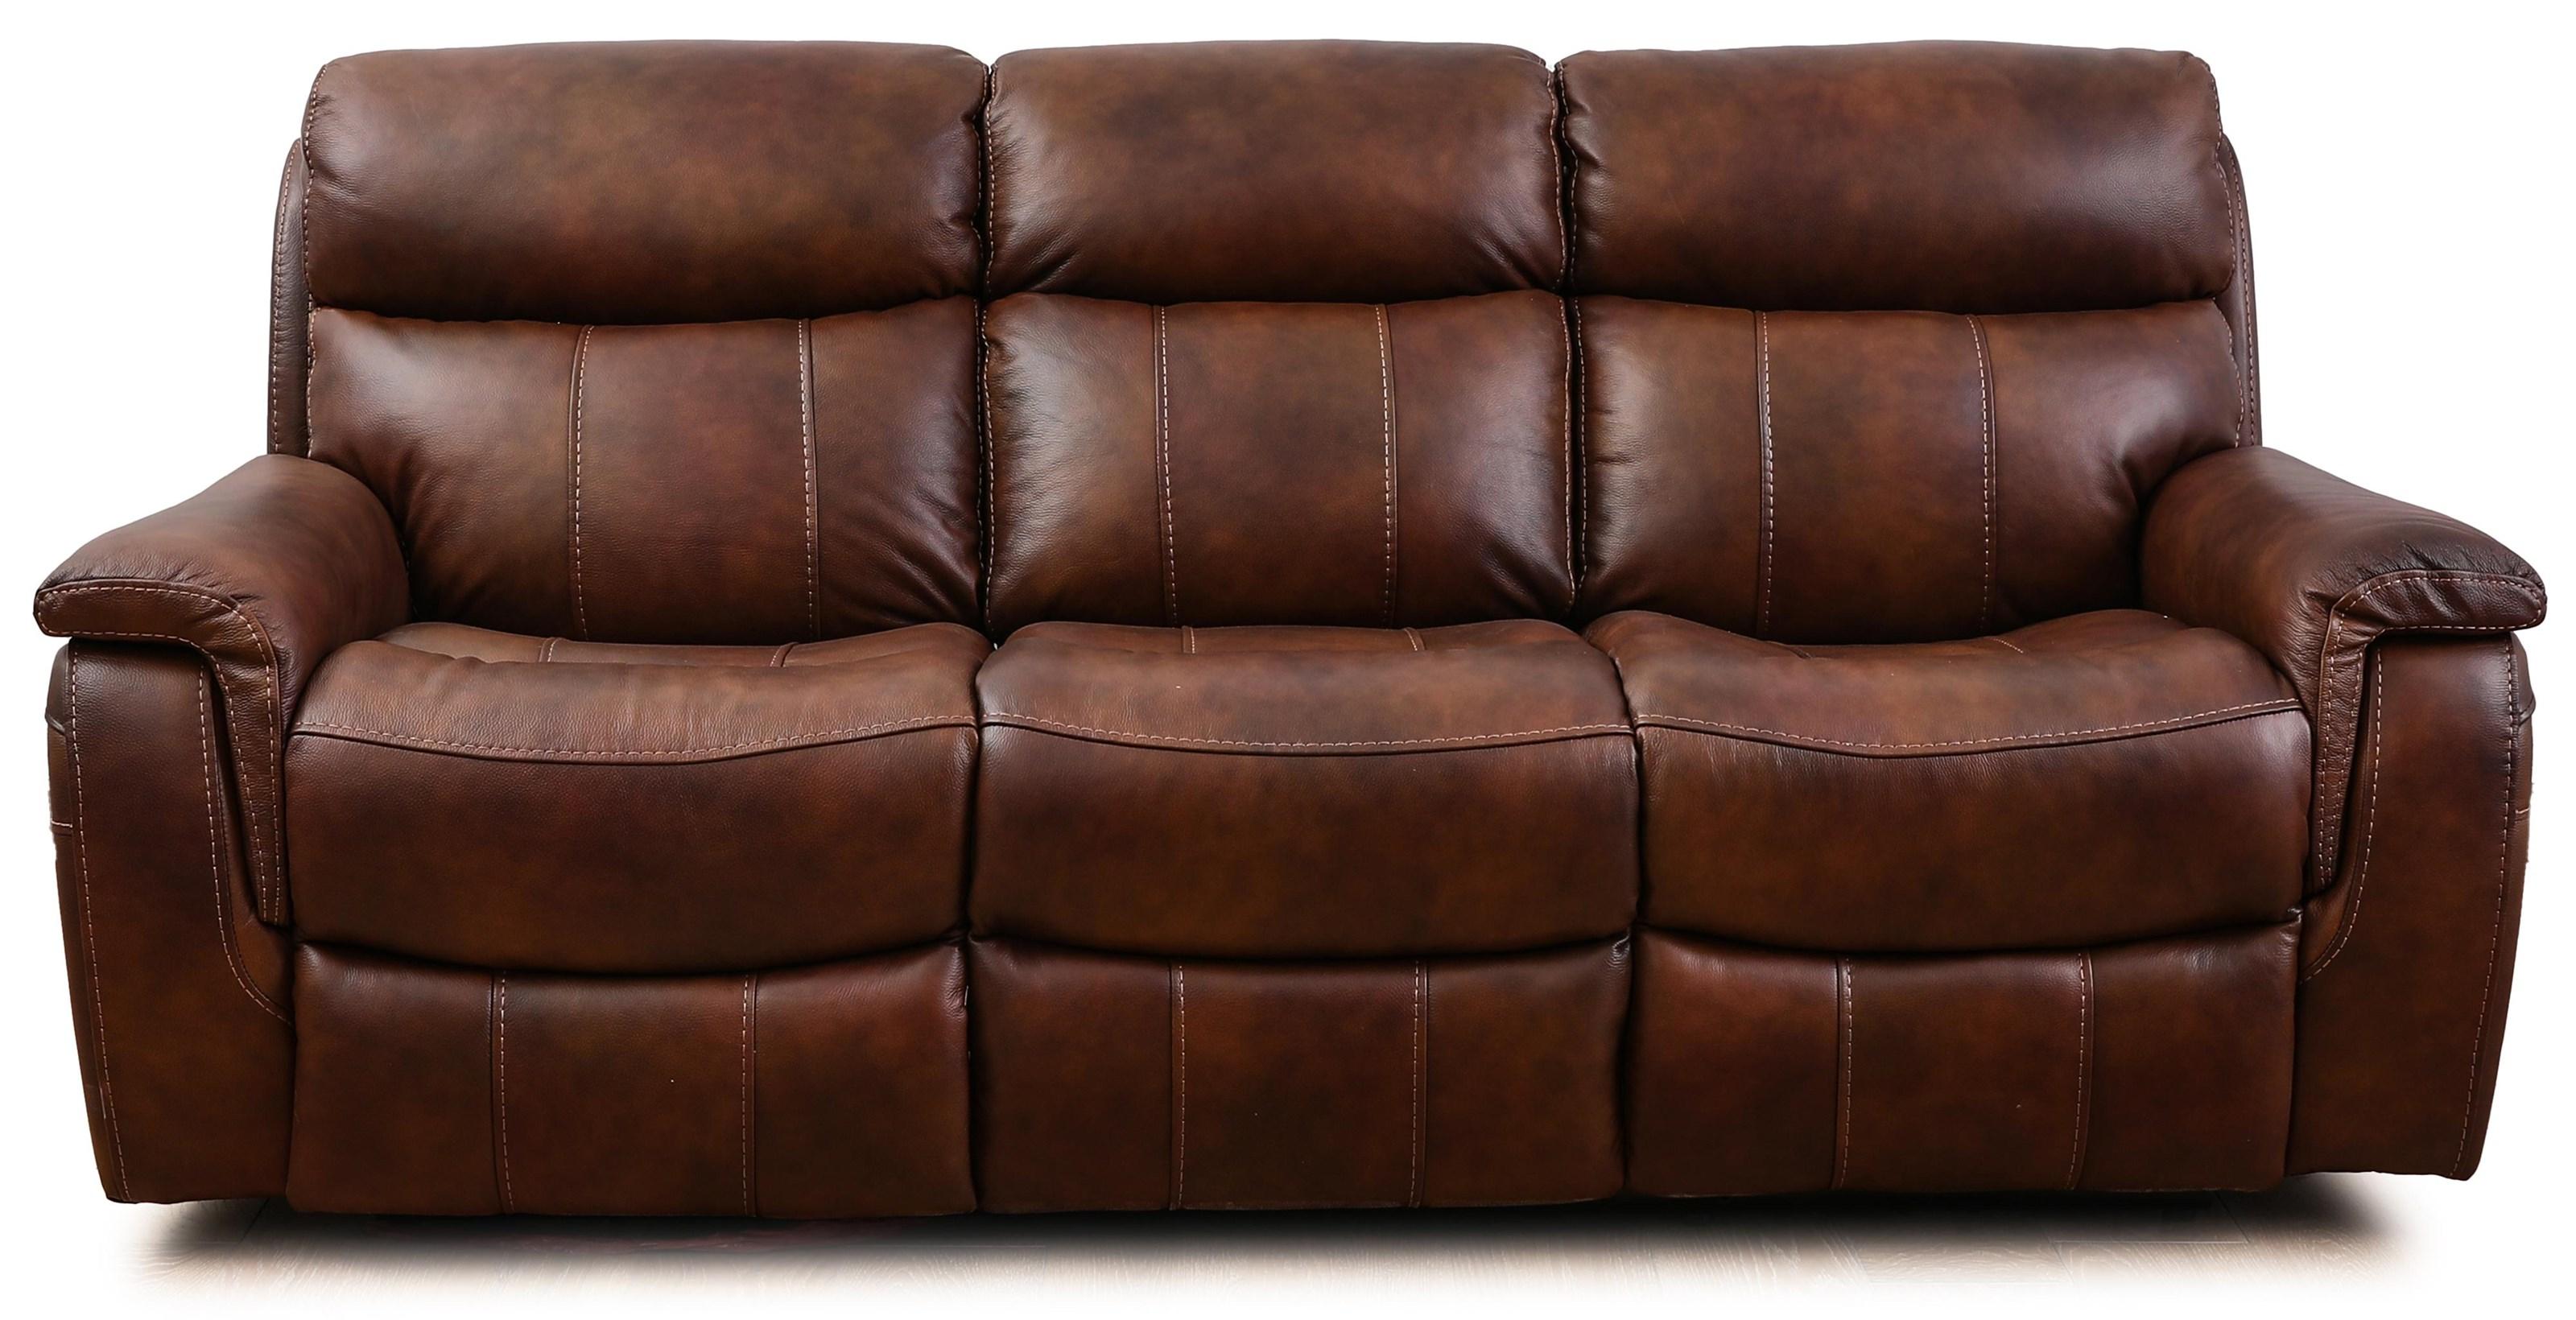 9020 Power Reclining Sofa at Pilgrim Furniture City